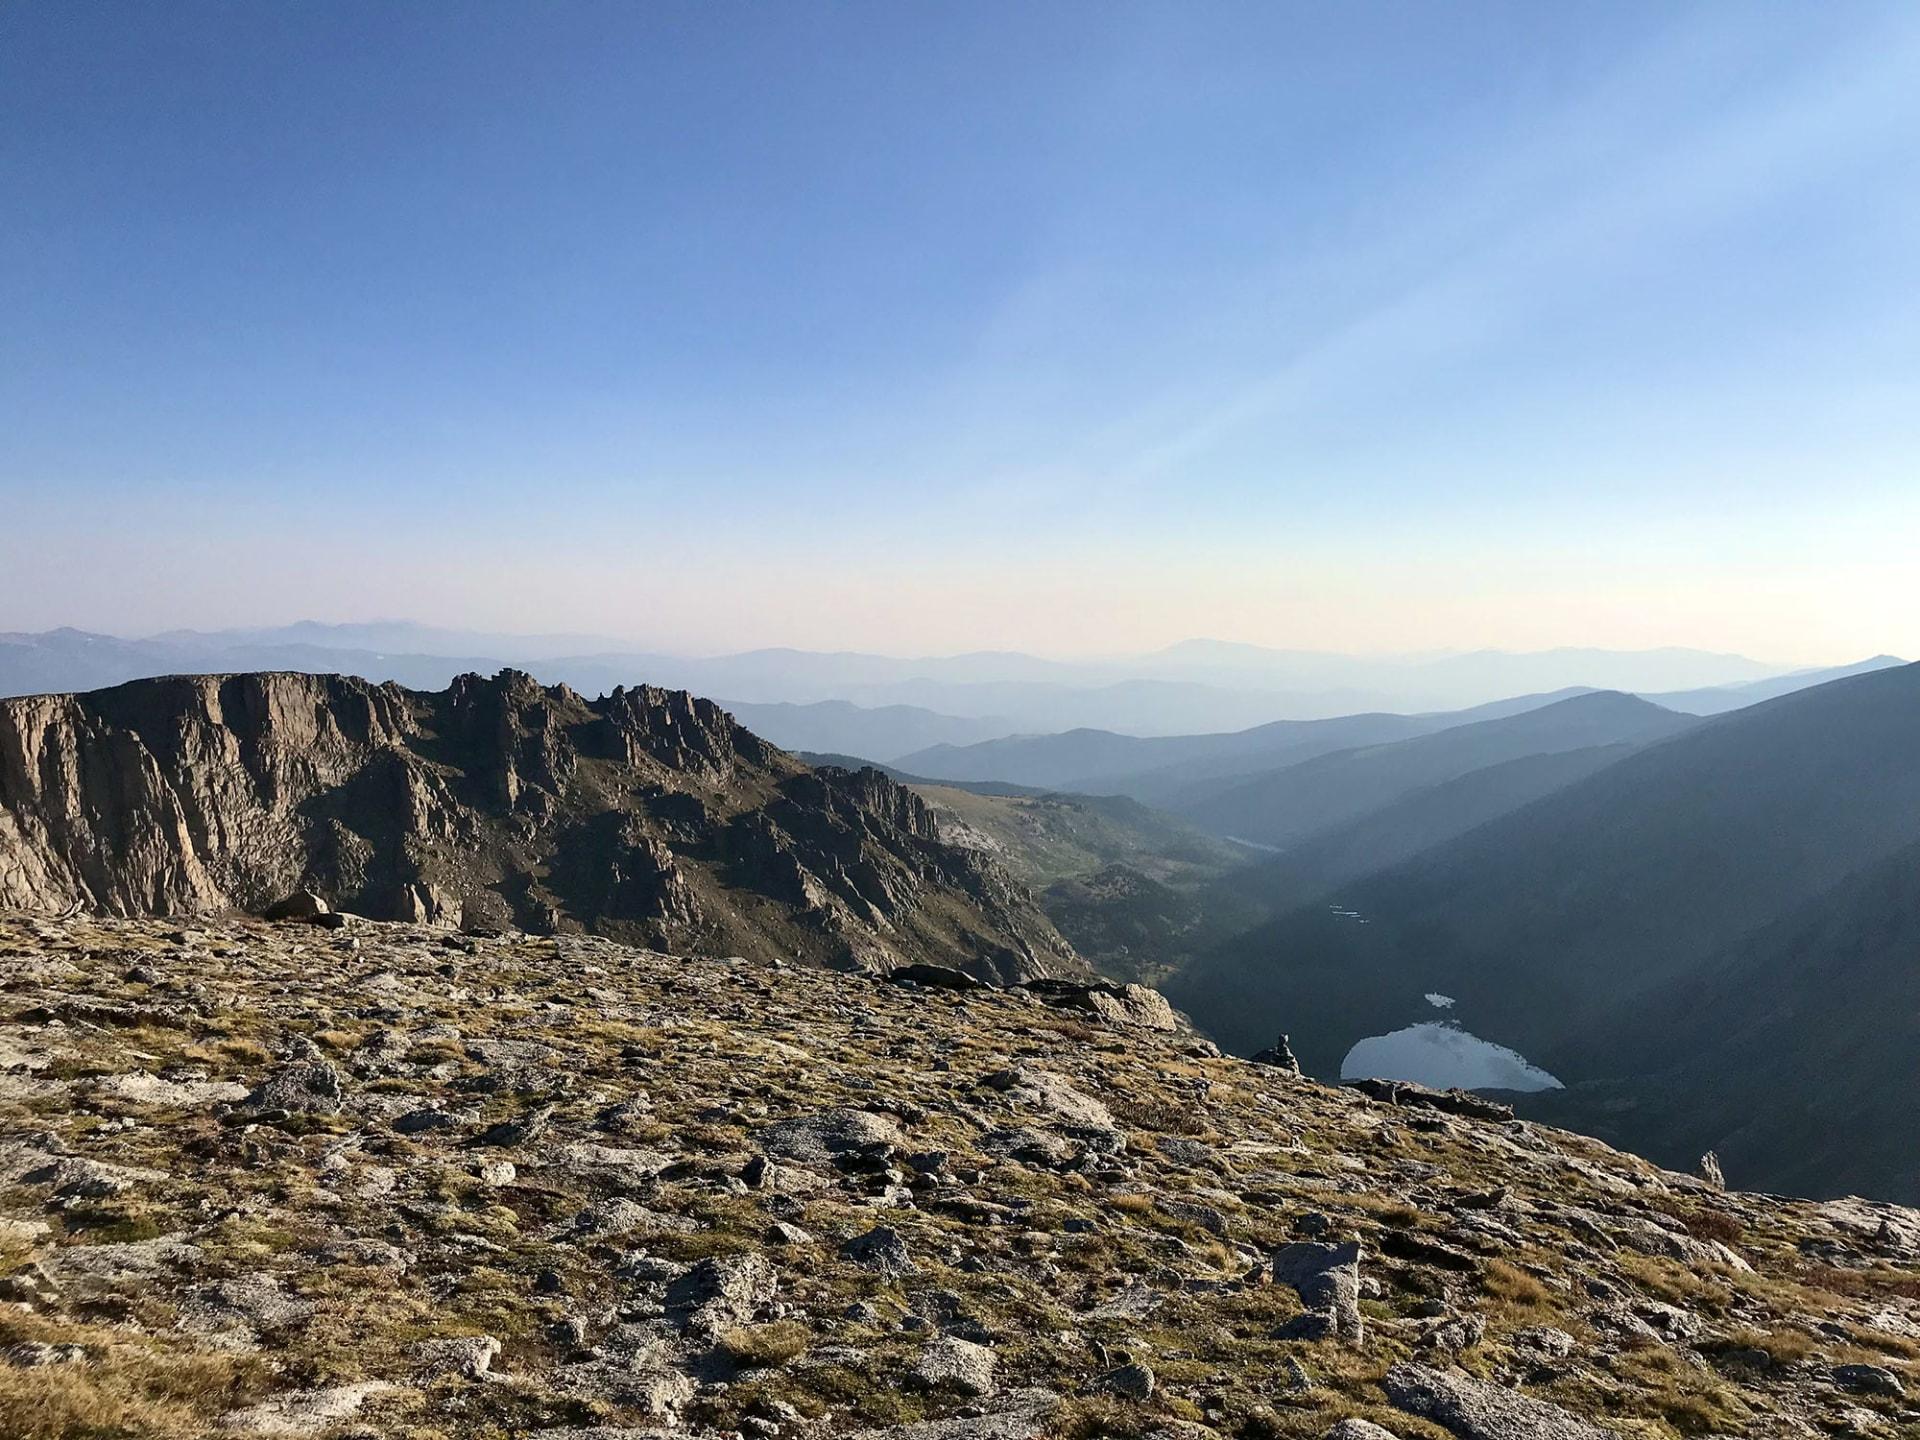 14er Season in the Rocky Mountains